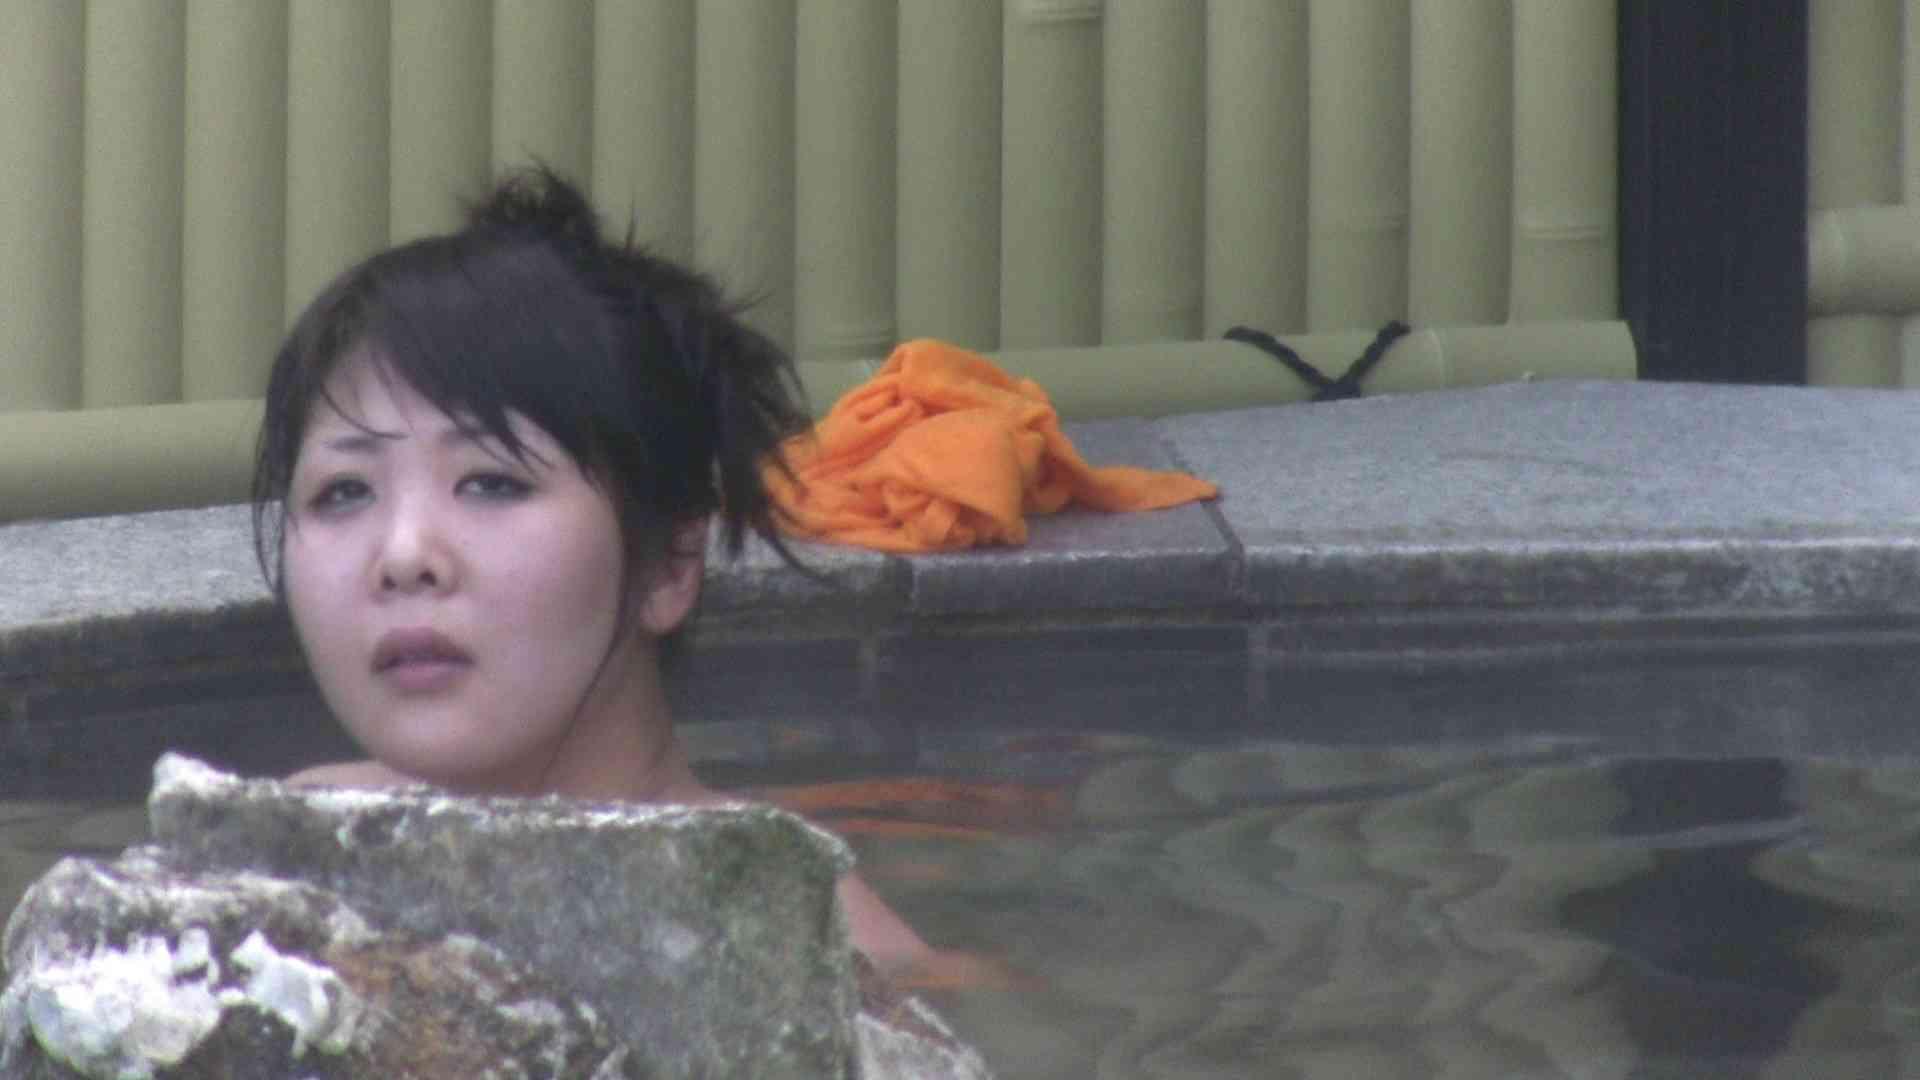 Aquaな露天風呂Vol.118 女体盗撮 隠し撮りAV無料 68連発 44